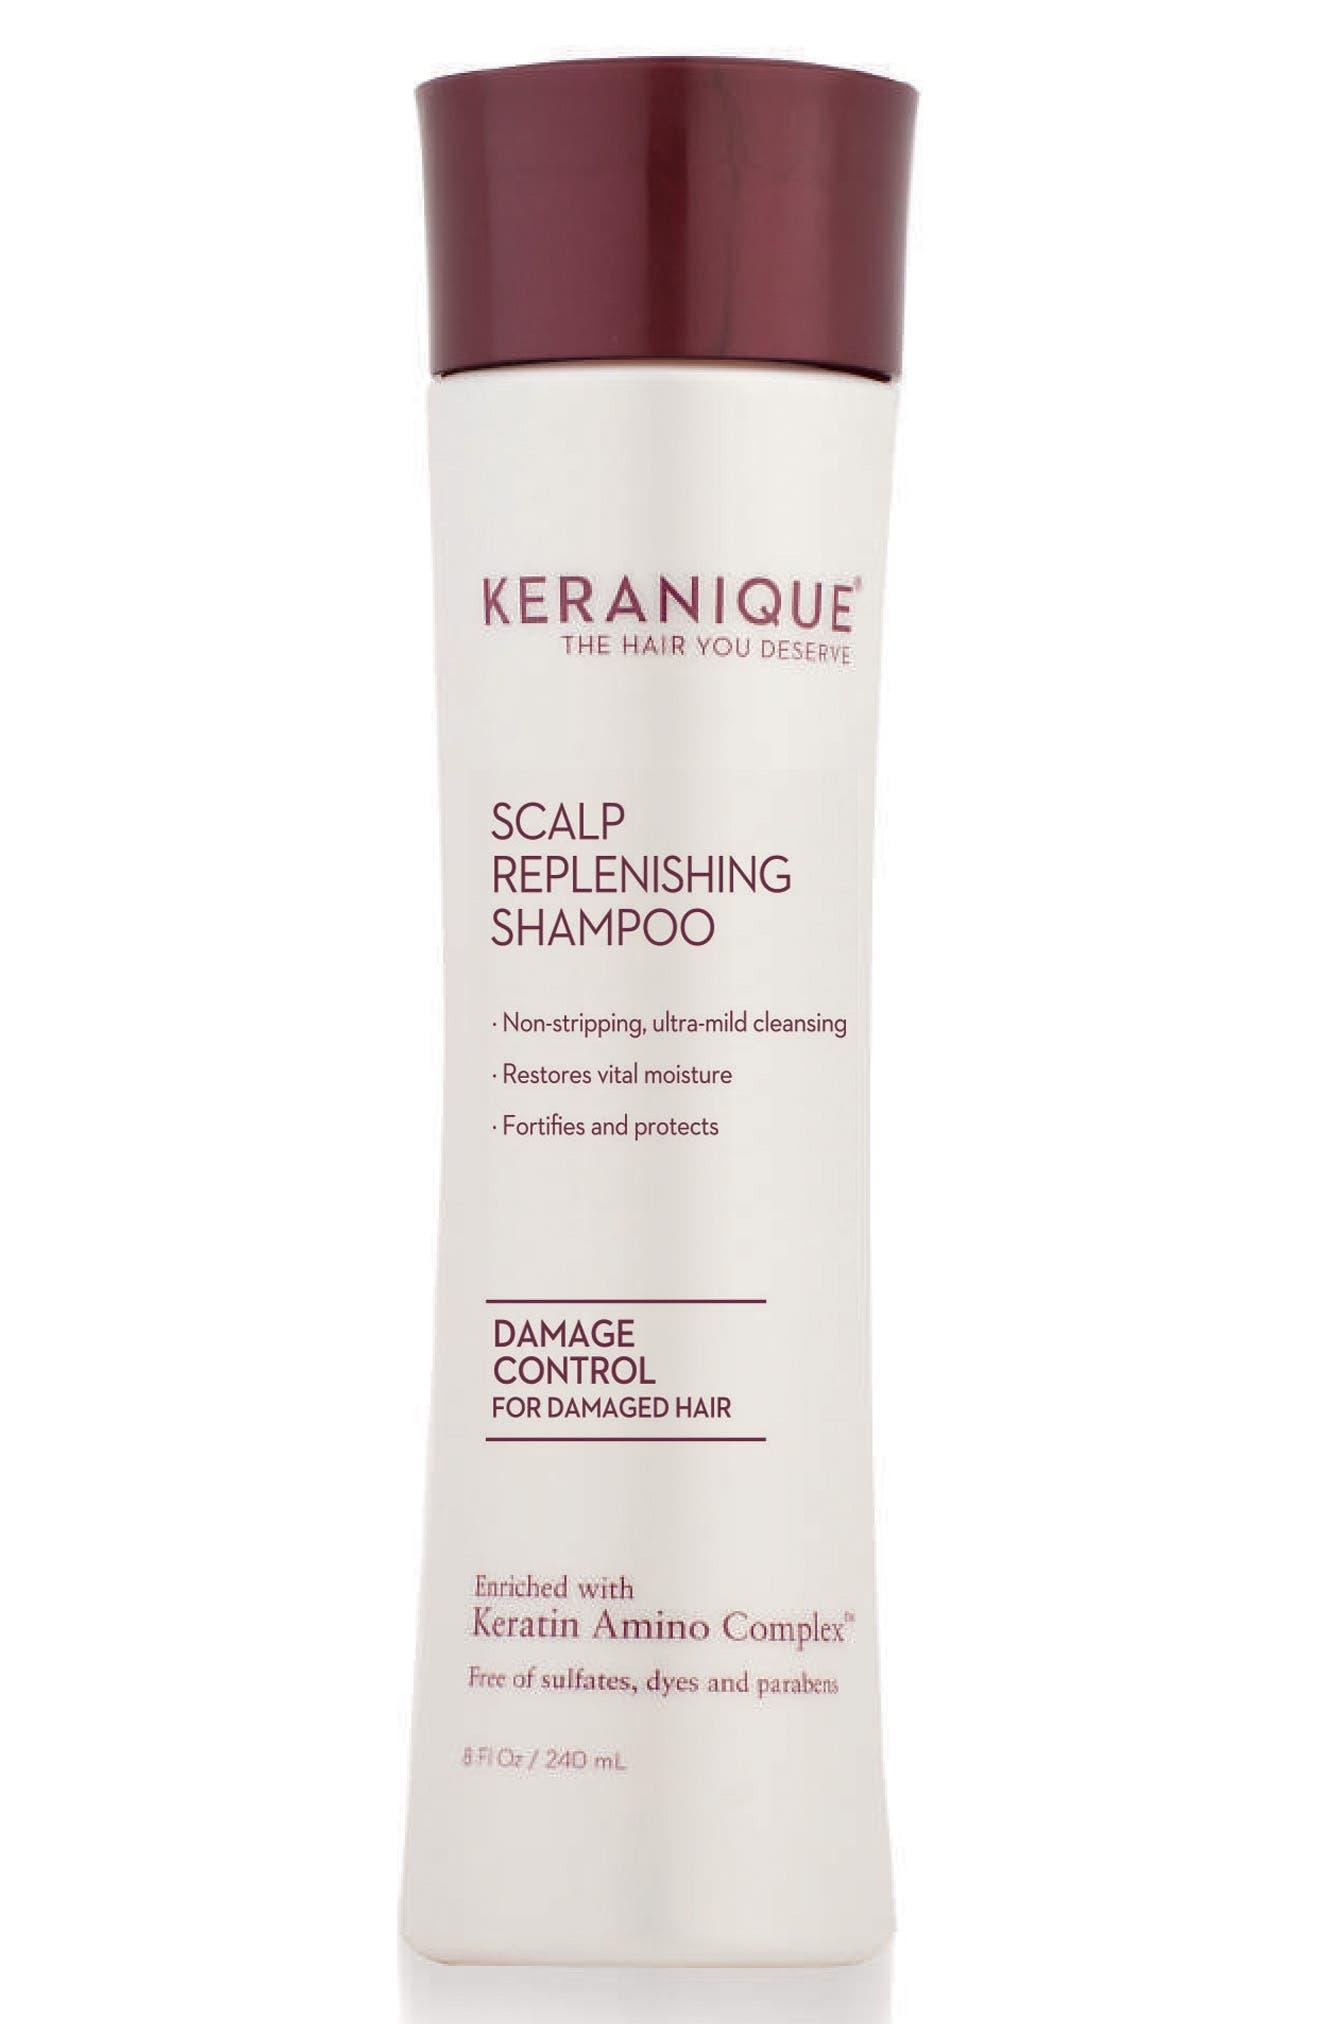 Keranique Scalp Replenishing Shampoo Damage Control